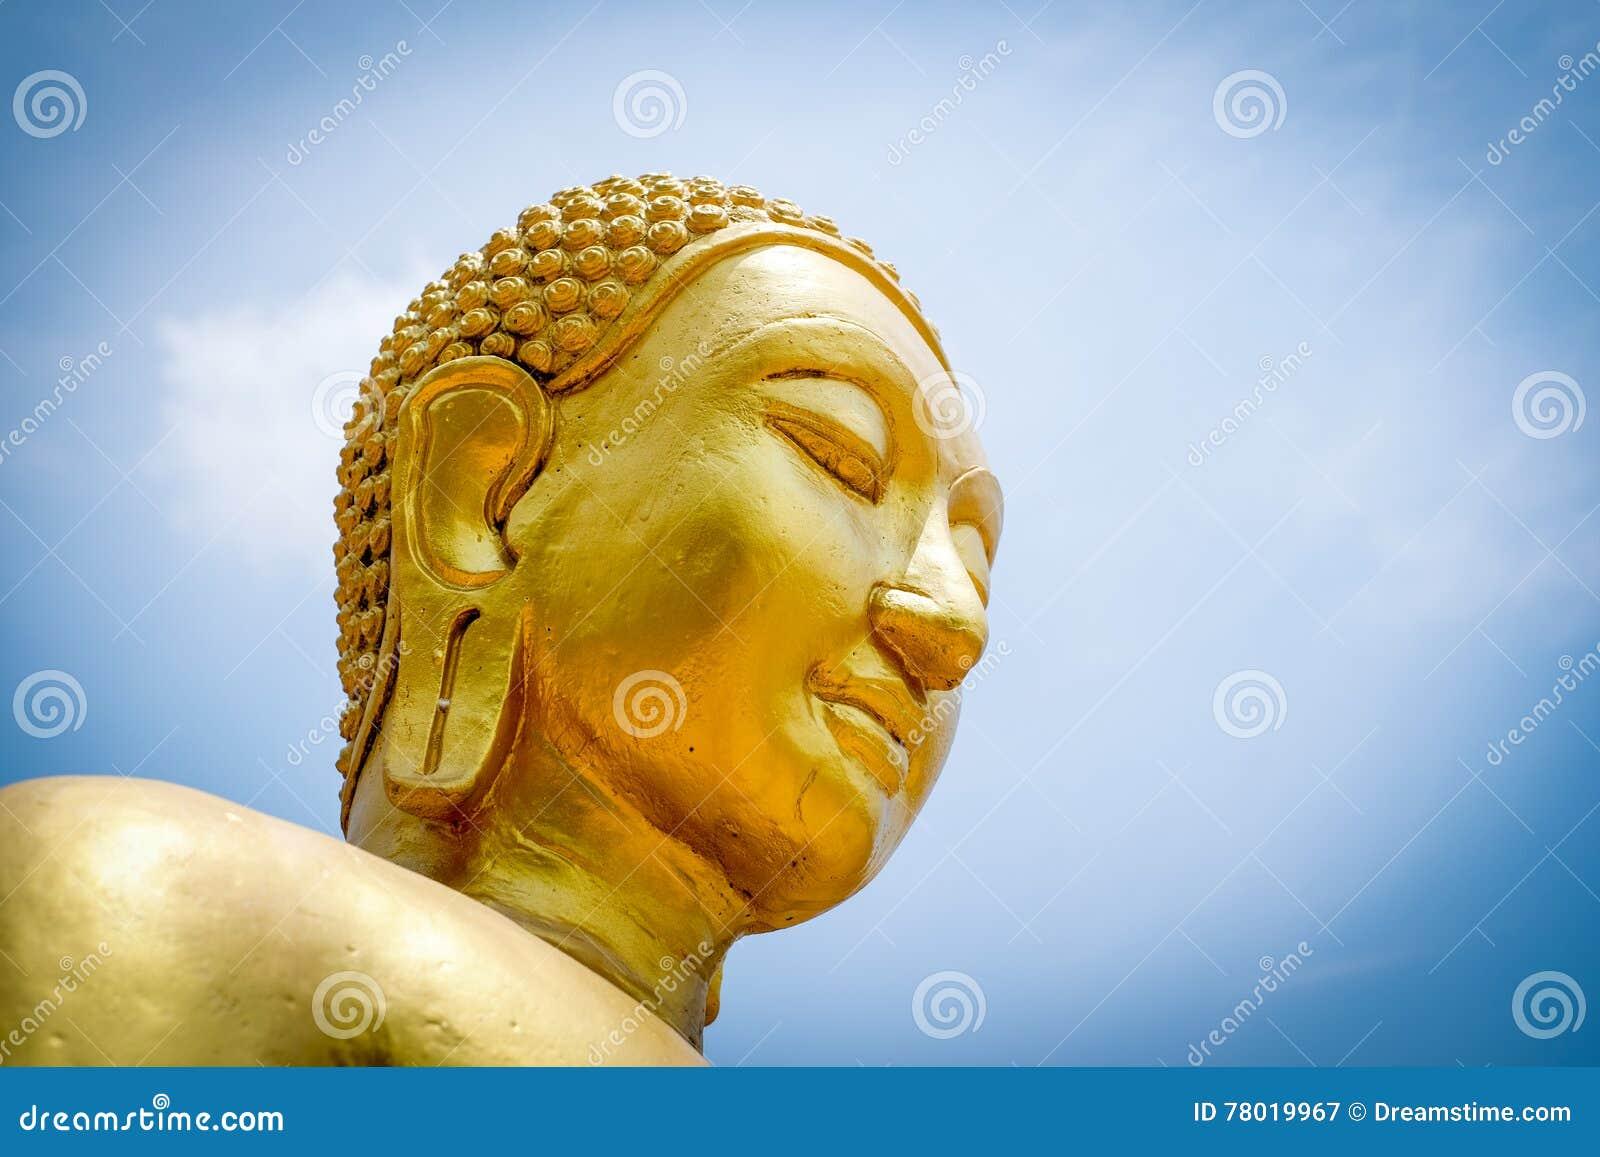 Buddha statue on blue sky